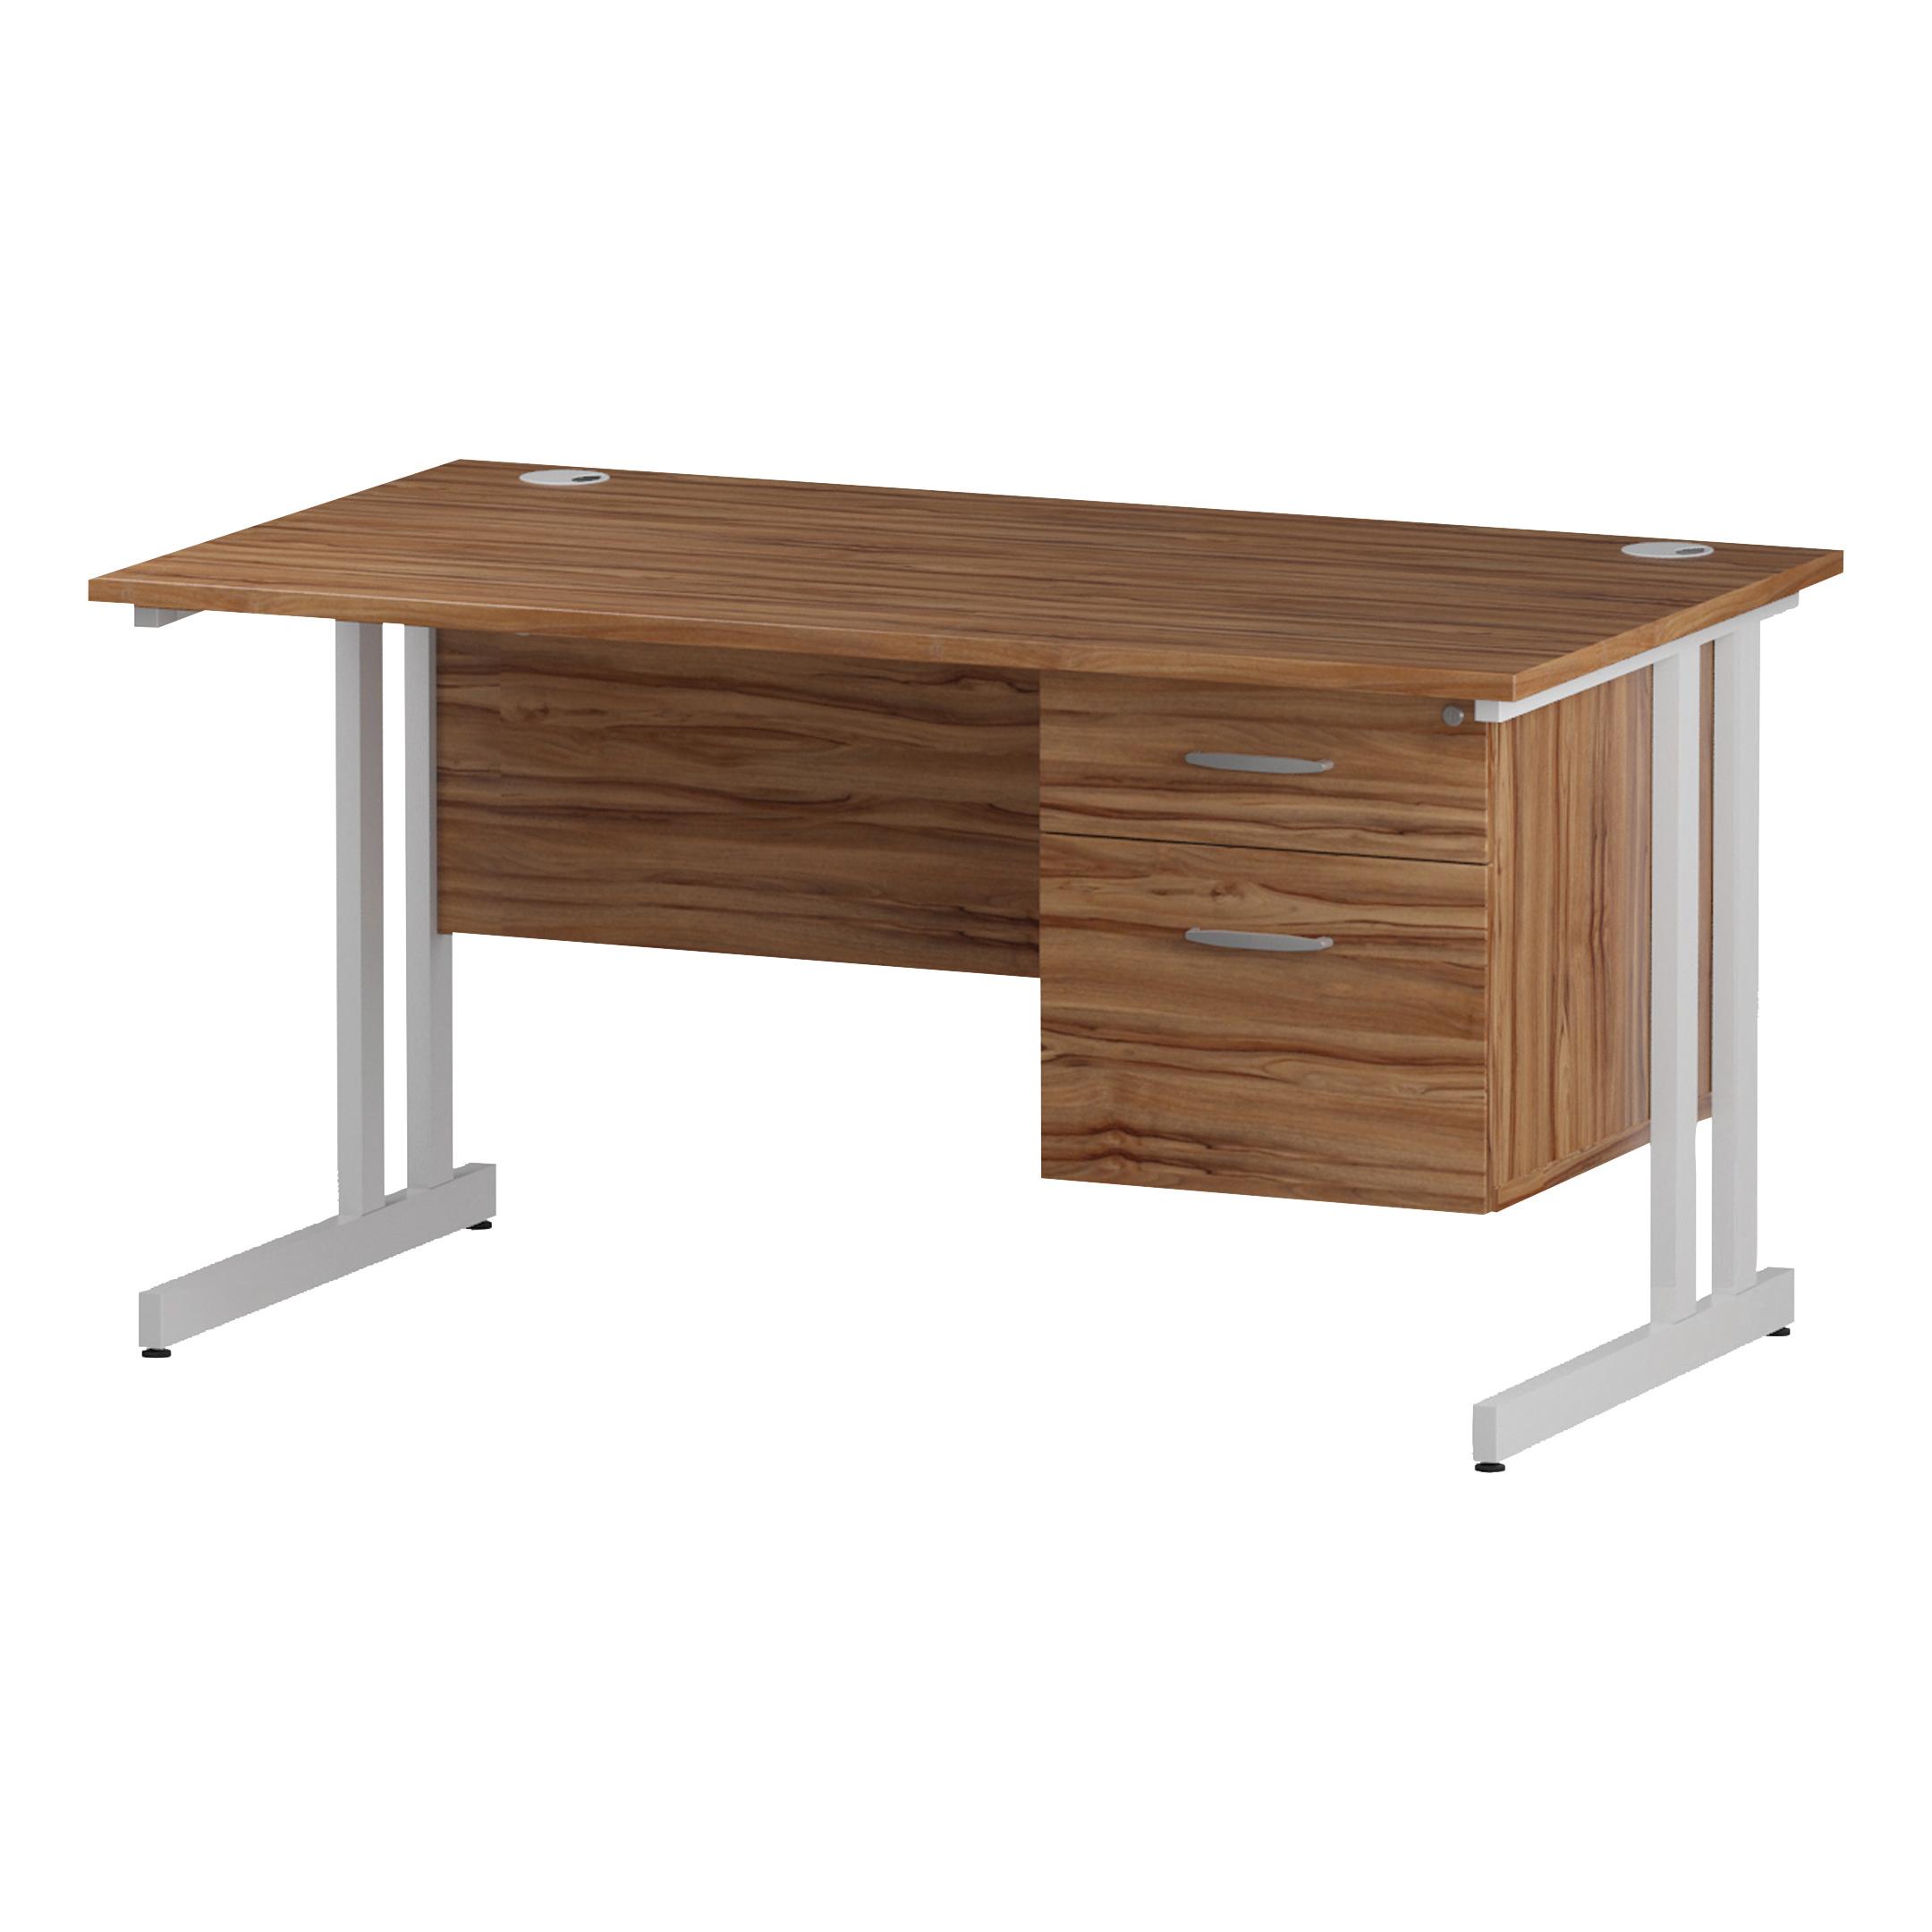 Trexus Rectangular Desk White Cantilever Leg 1400x800mm Fixed Pedestal 2 Drawers Walnut Ref I001924